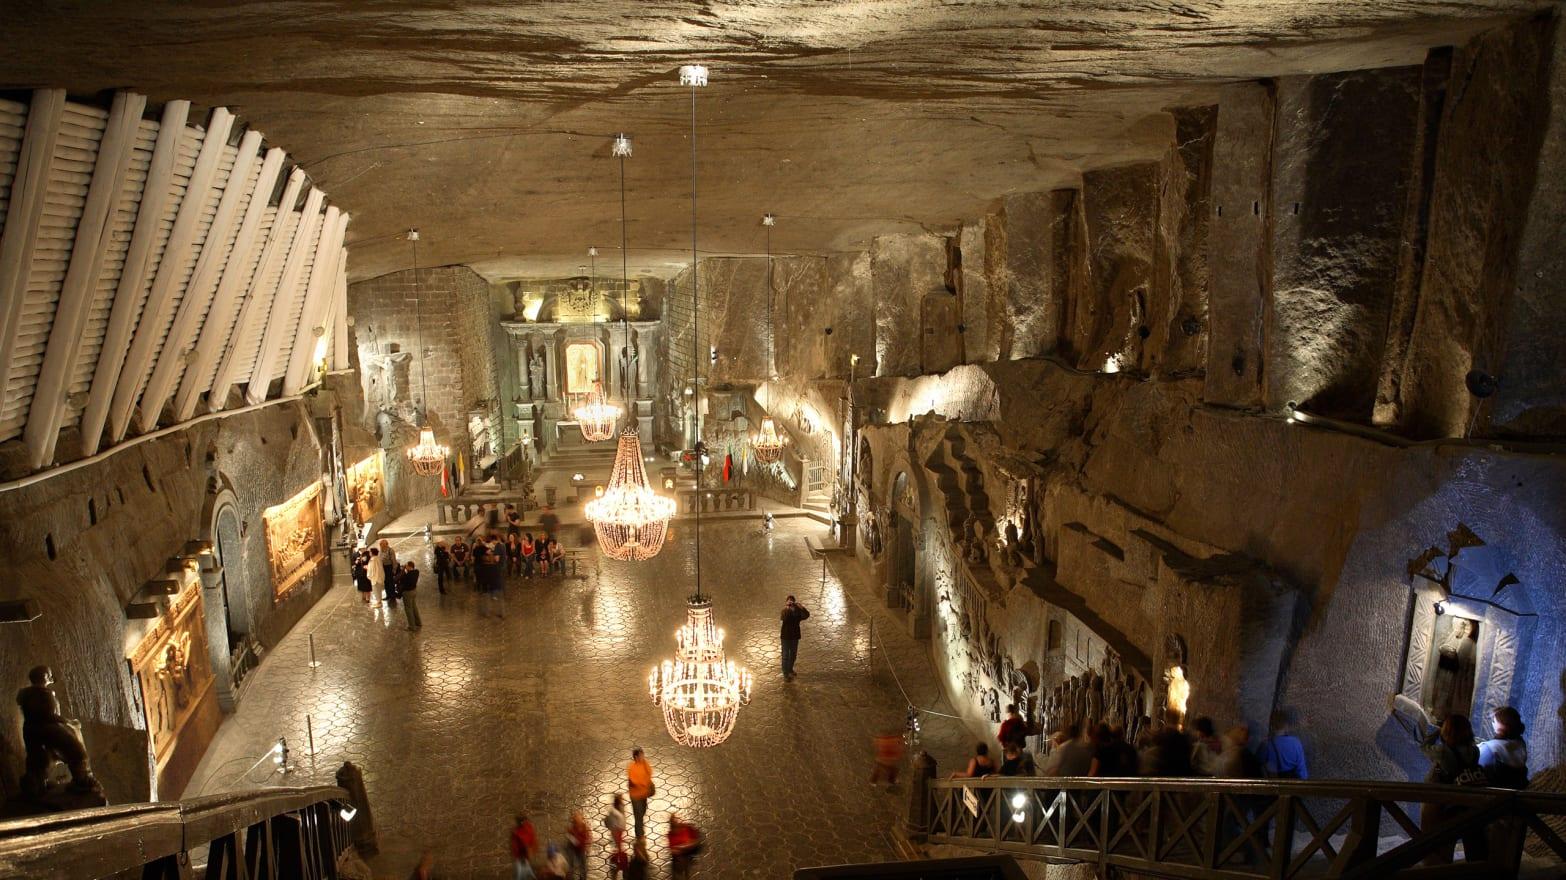 Wieliczka Salt Mine Is an Incredible Polish Underground